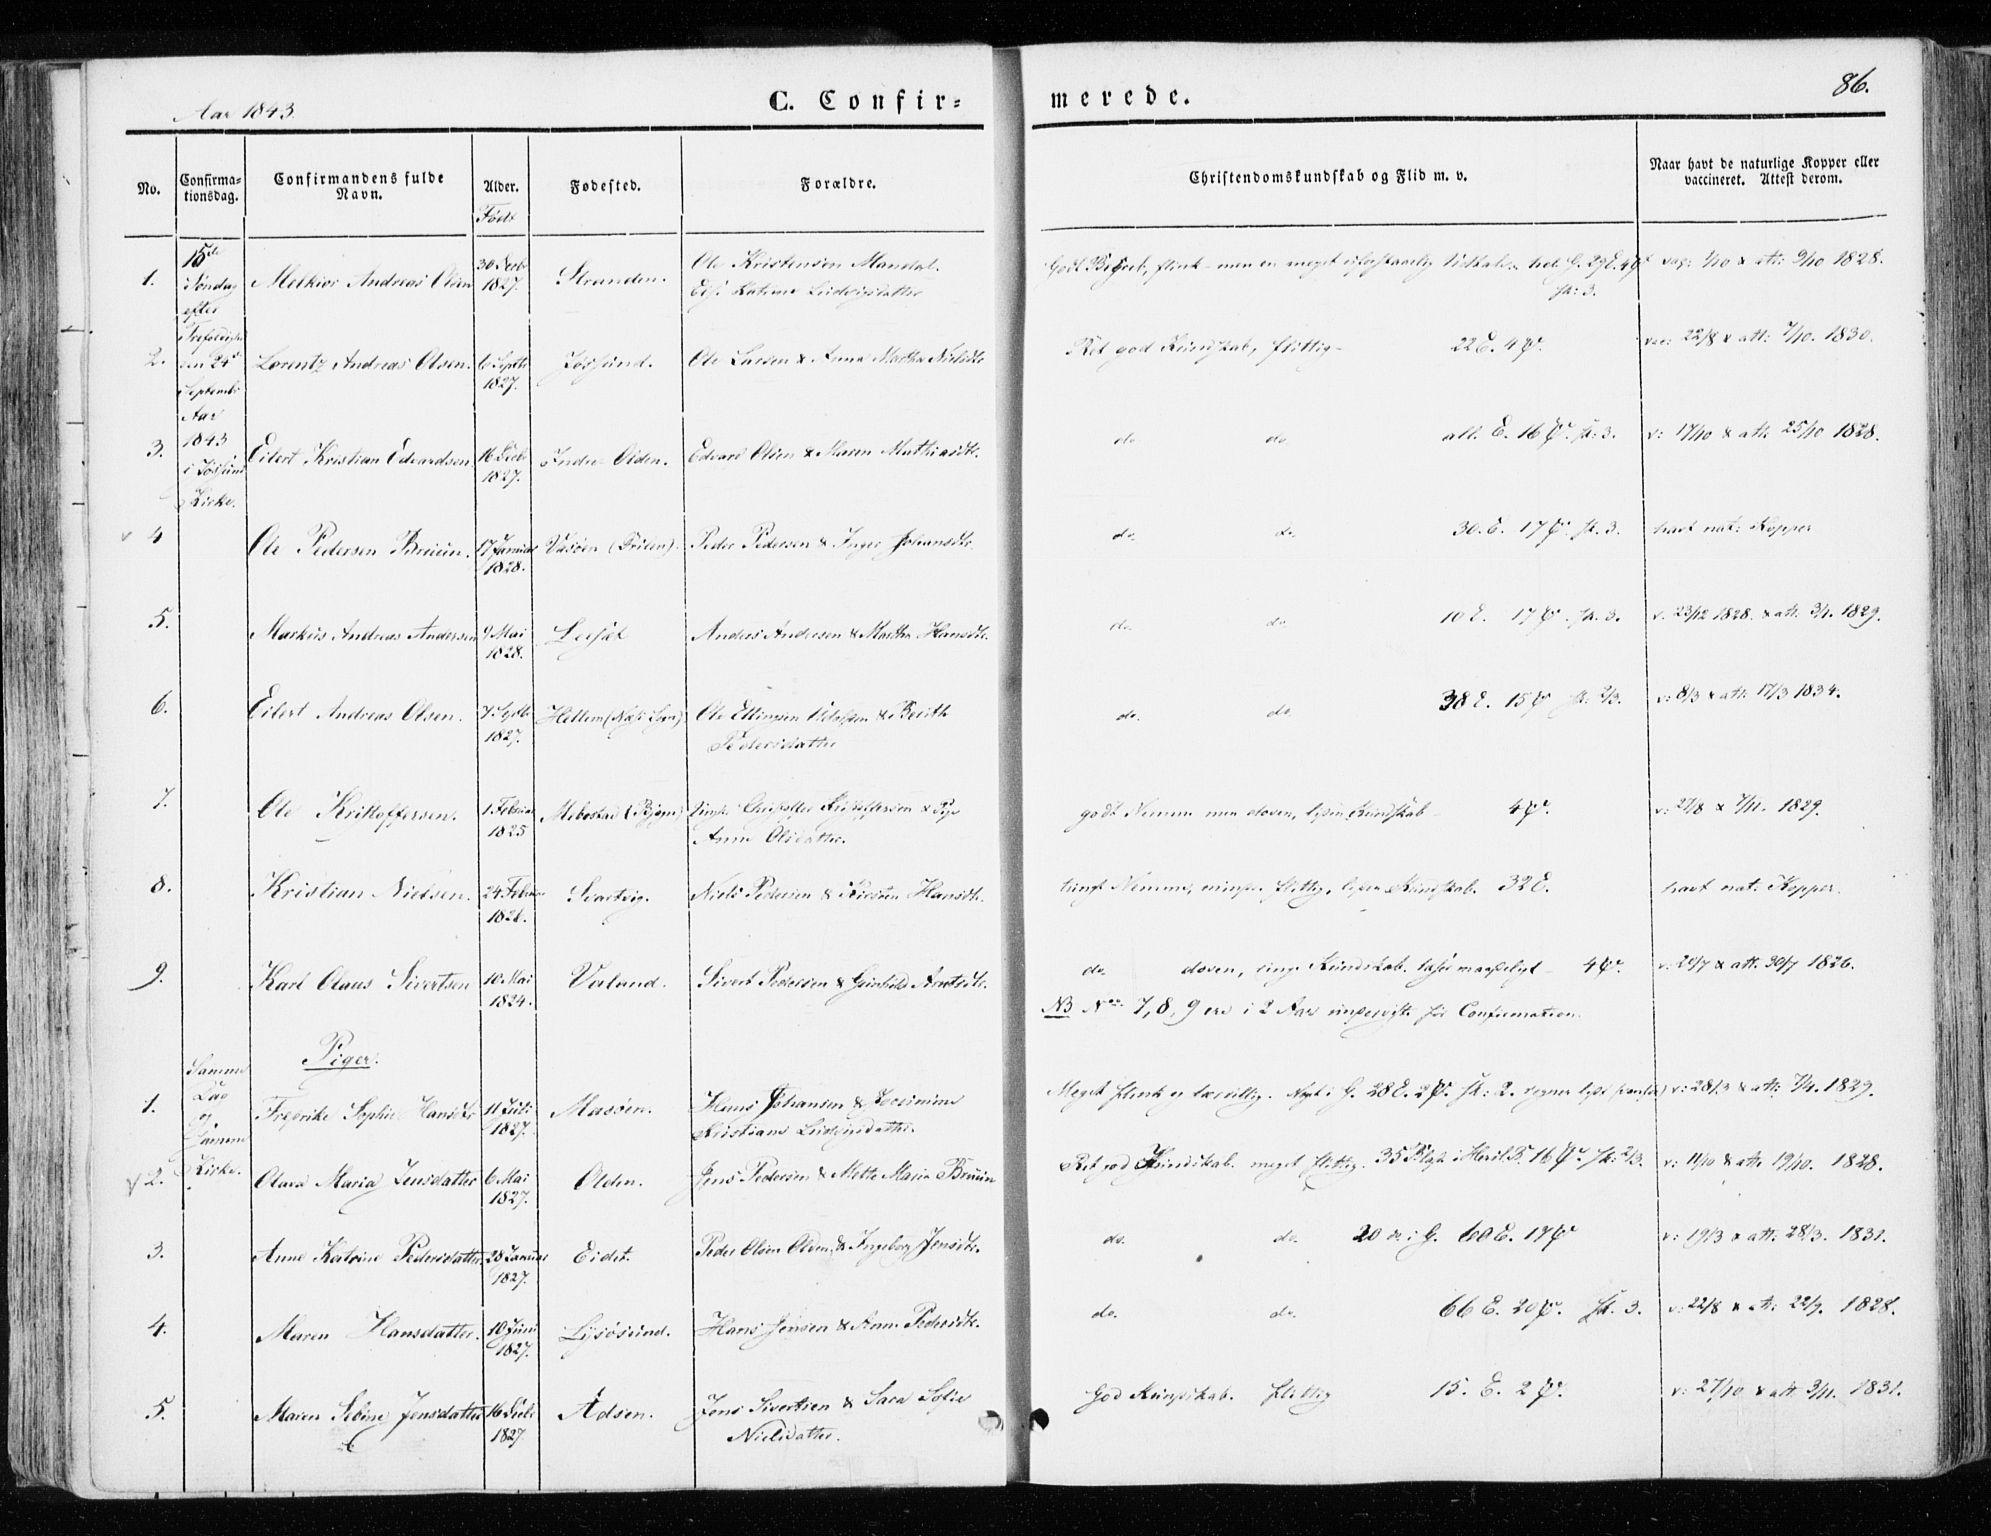 SAT, Ministerialprotokoller, klokkerbøker og fødselsregistre - Sør-Trøndelag, 655/L0677: Parish register (official) no. 655A06, 1847-1860, p. 86